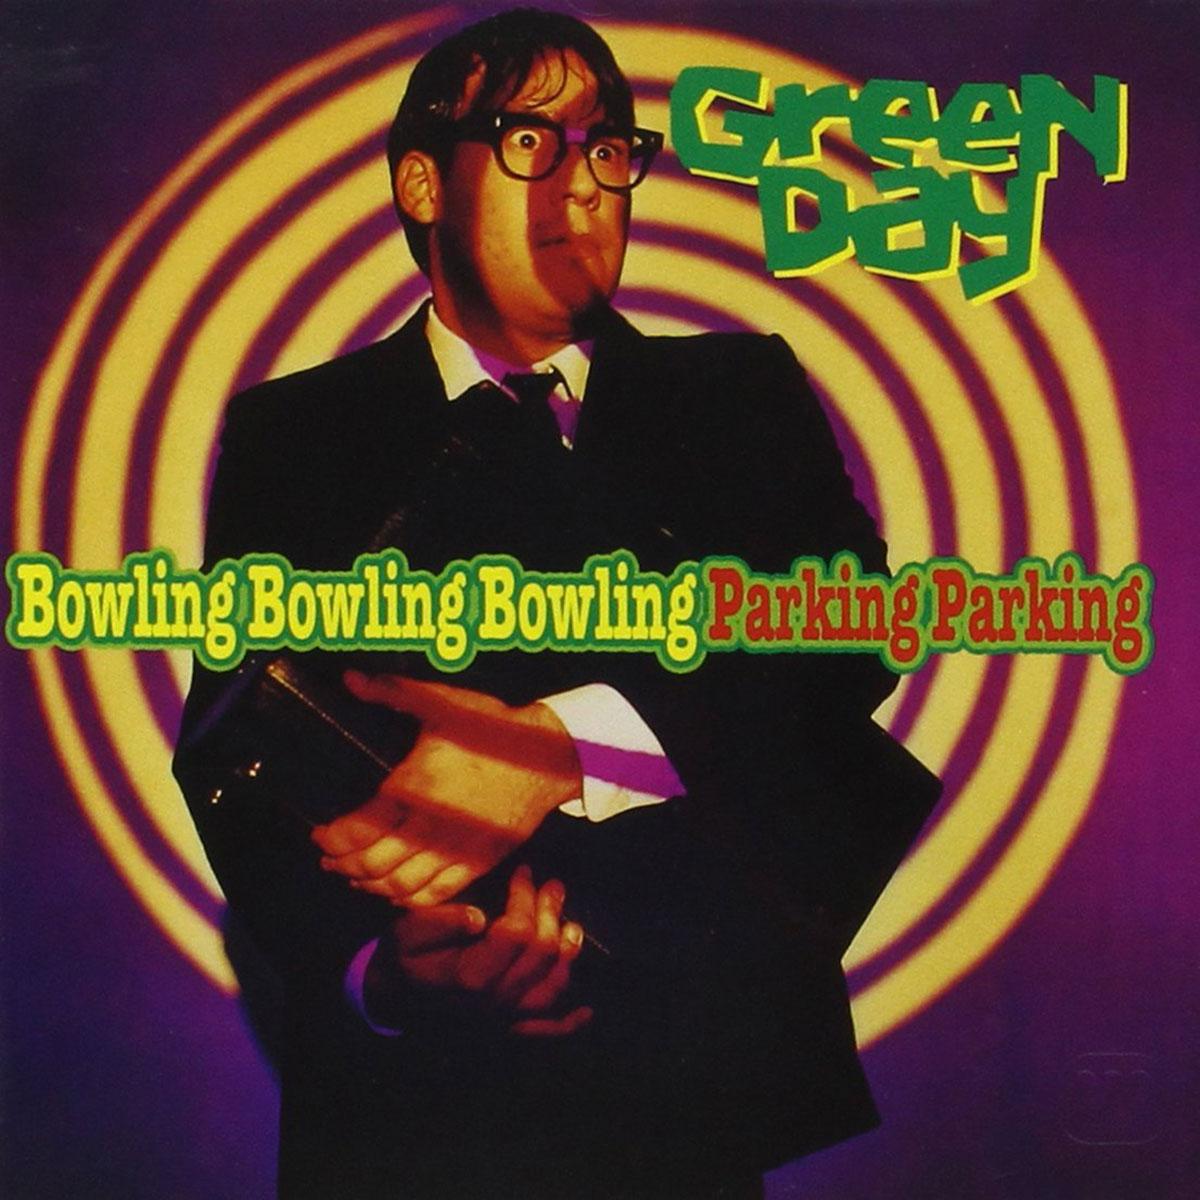 Green Day - Bowling Bowling Bowling Parking Parking